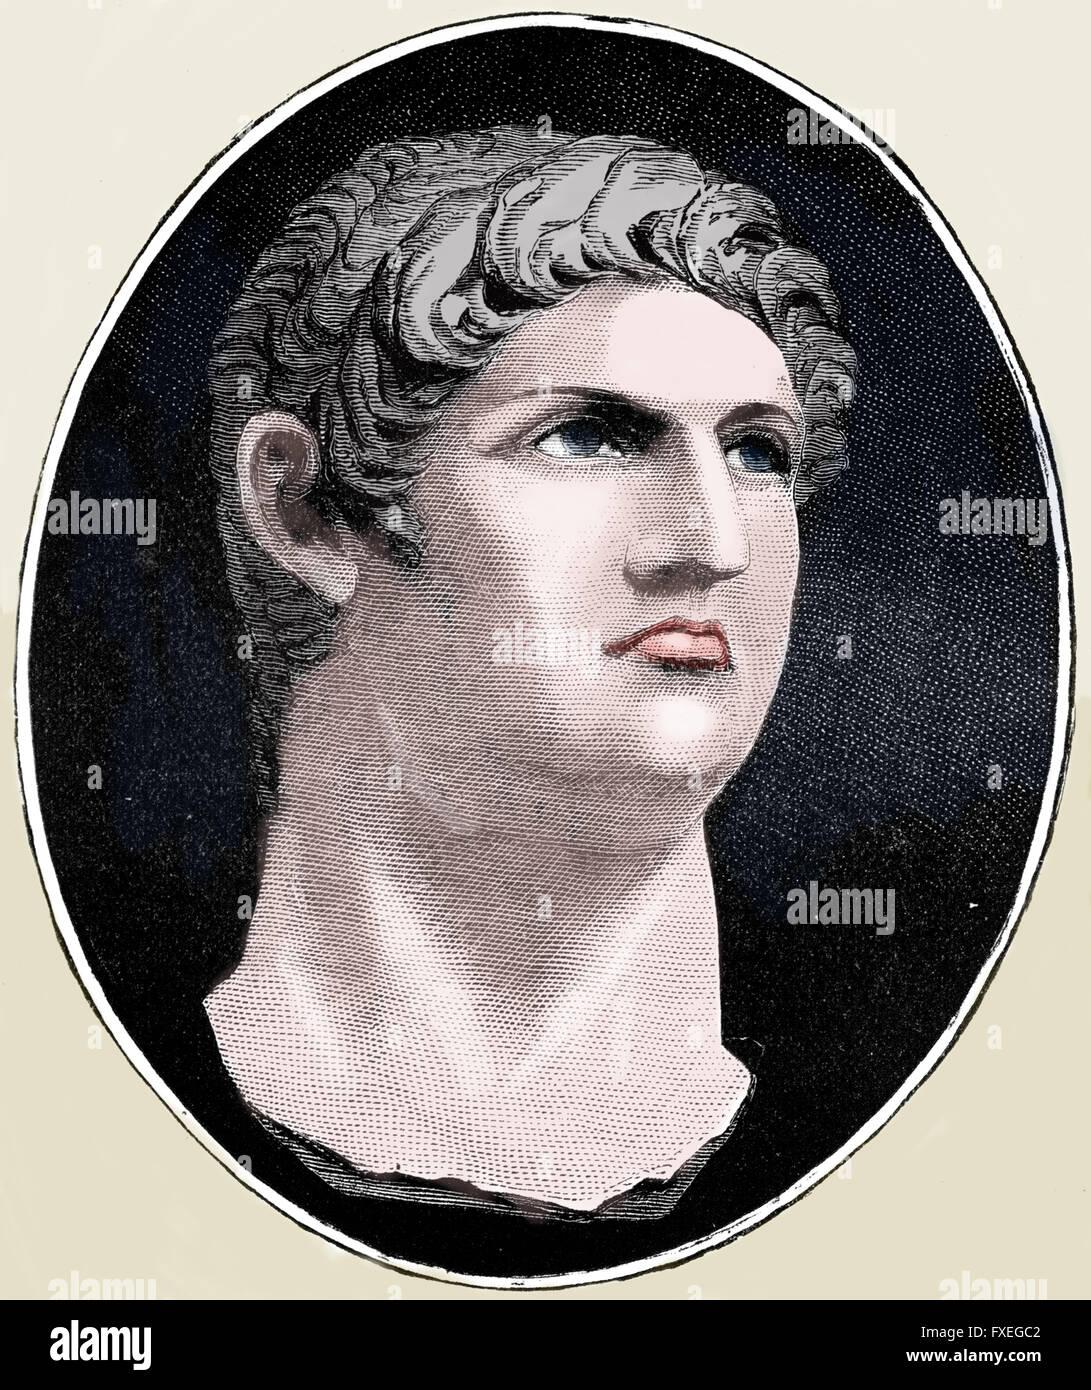 Nero (37 AD-68 AD). 5th Emperor of the Roman Empire. Julio-Claudian dynasty. Engraving. Color. - Stock Image